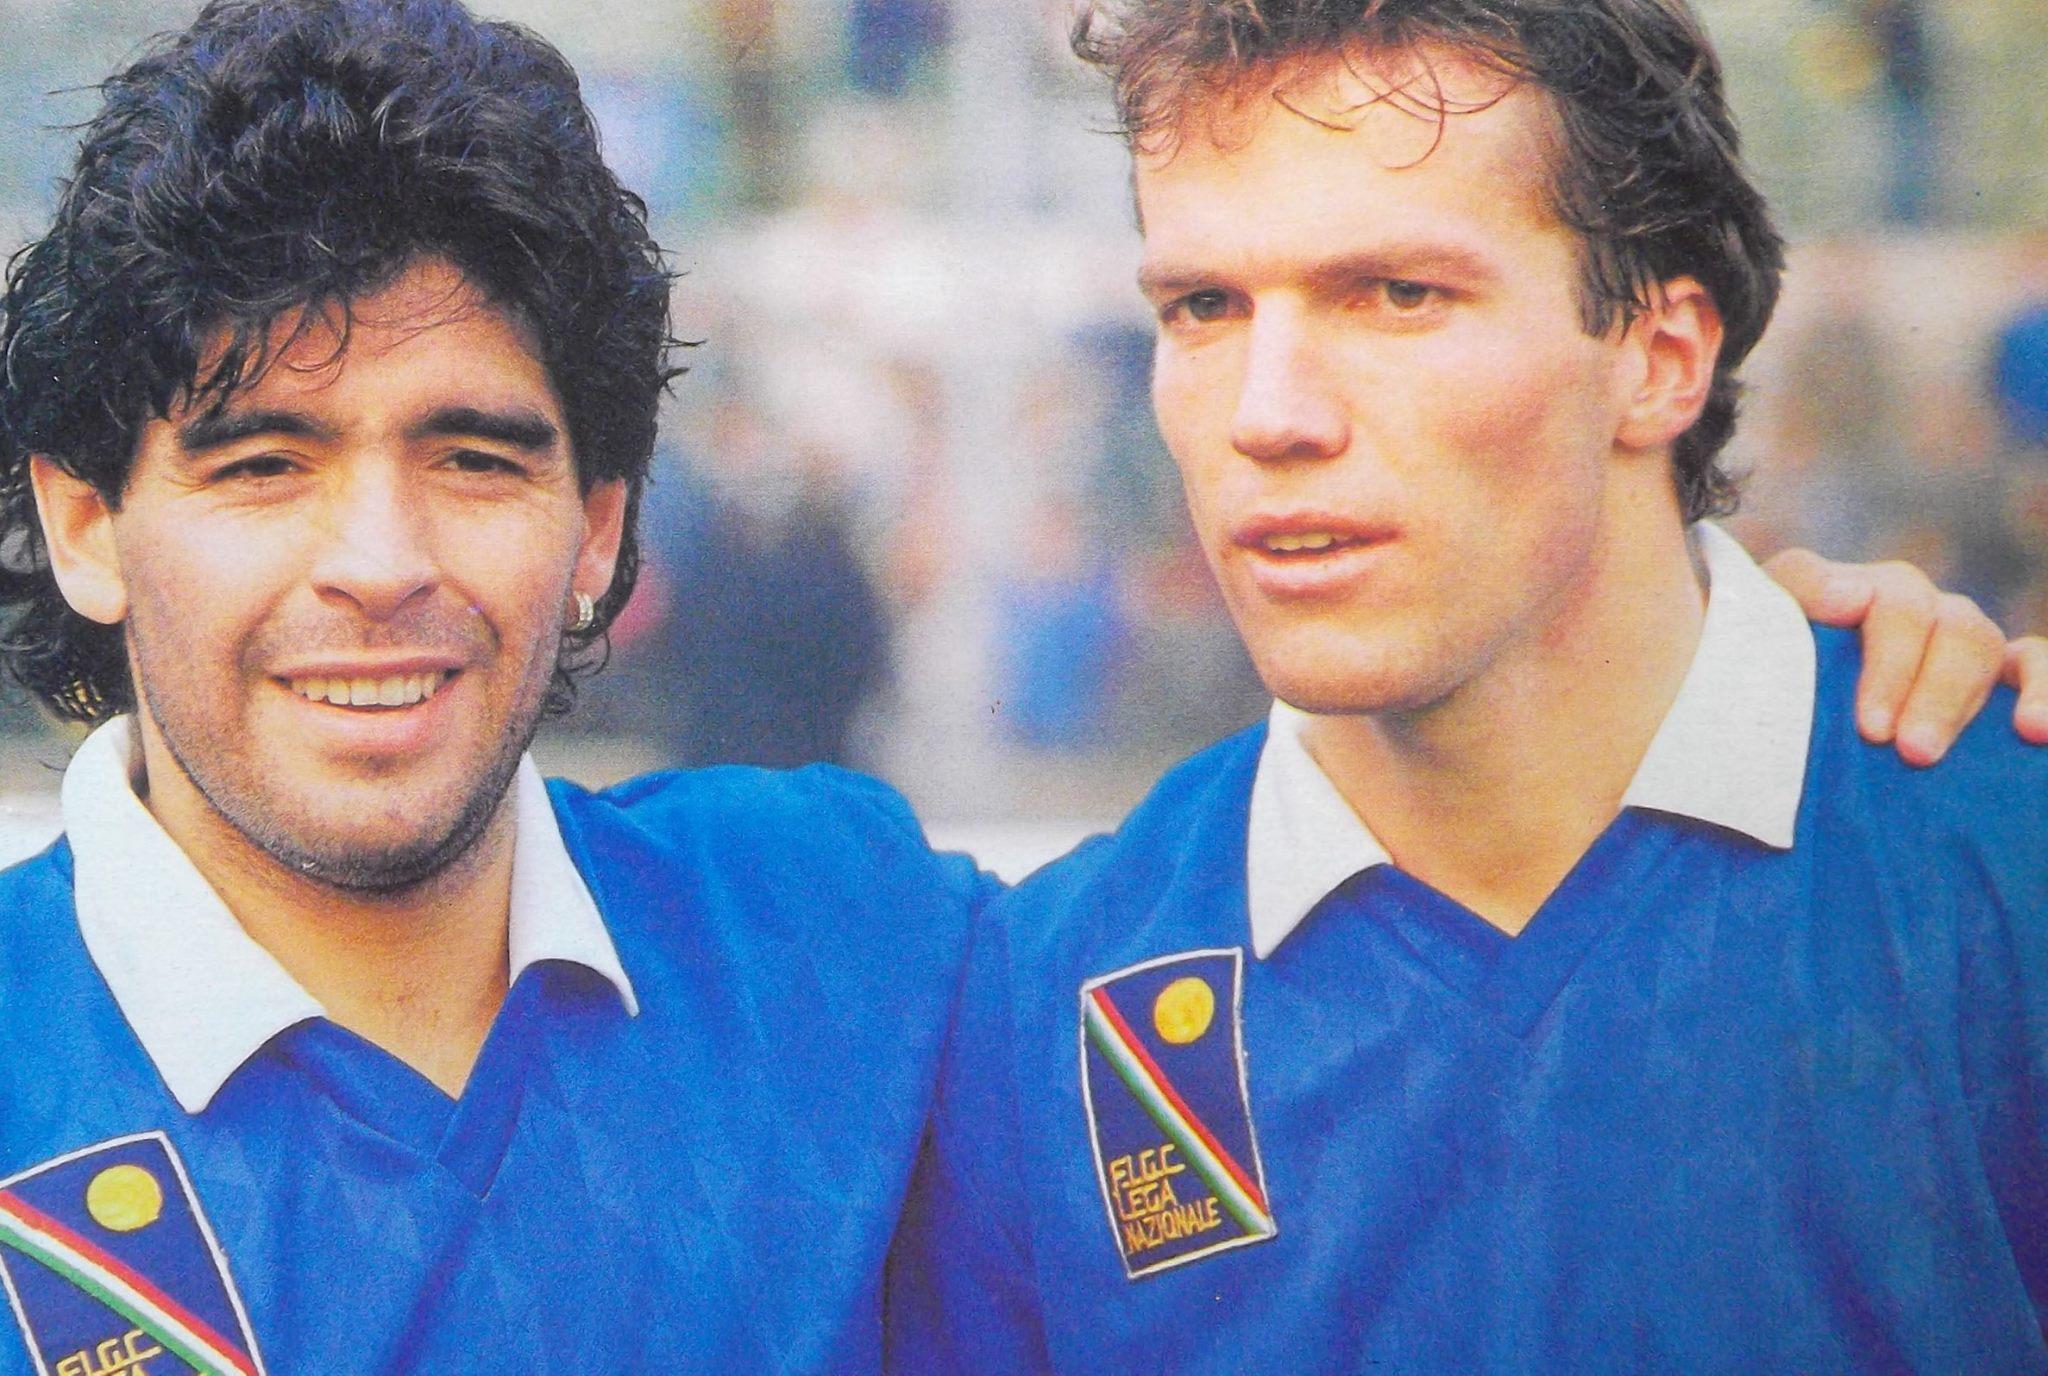 Nazionale_di_Lega_-_Milano_-_1988_-_Mara